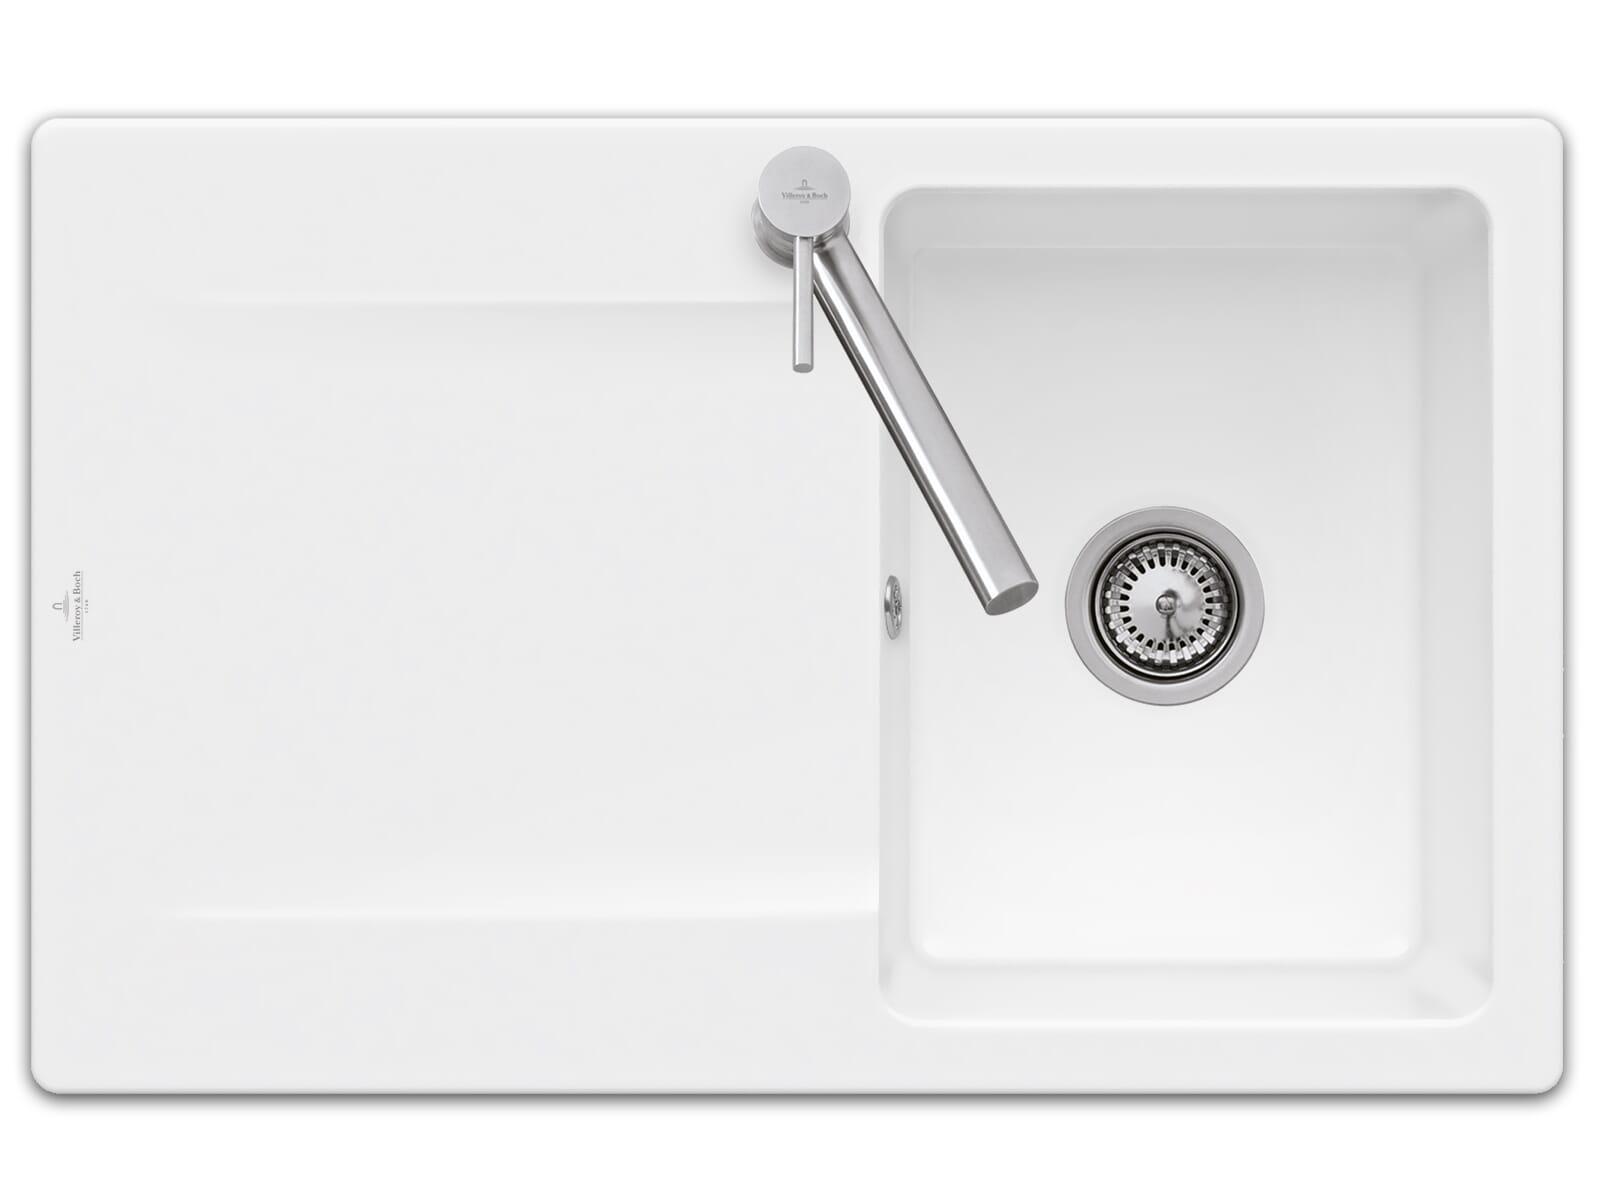 Villeroy & Boch Siluet 45 - 3334 01 RW Stone White Keramikspüle Handbetätigung